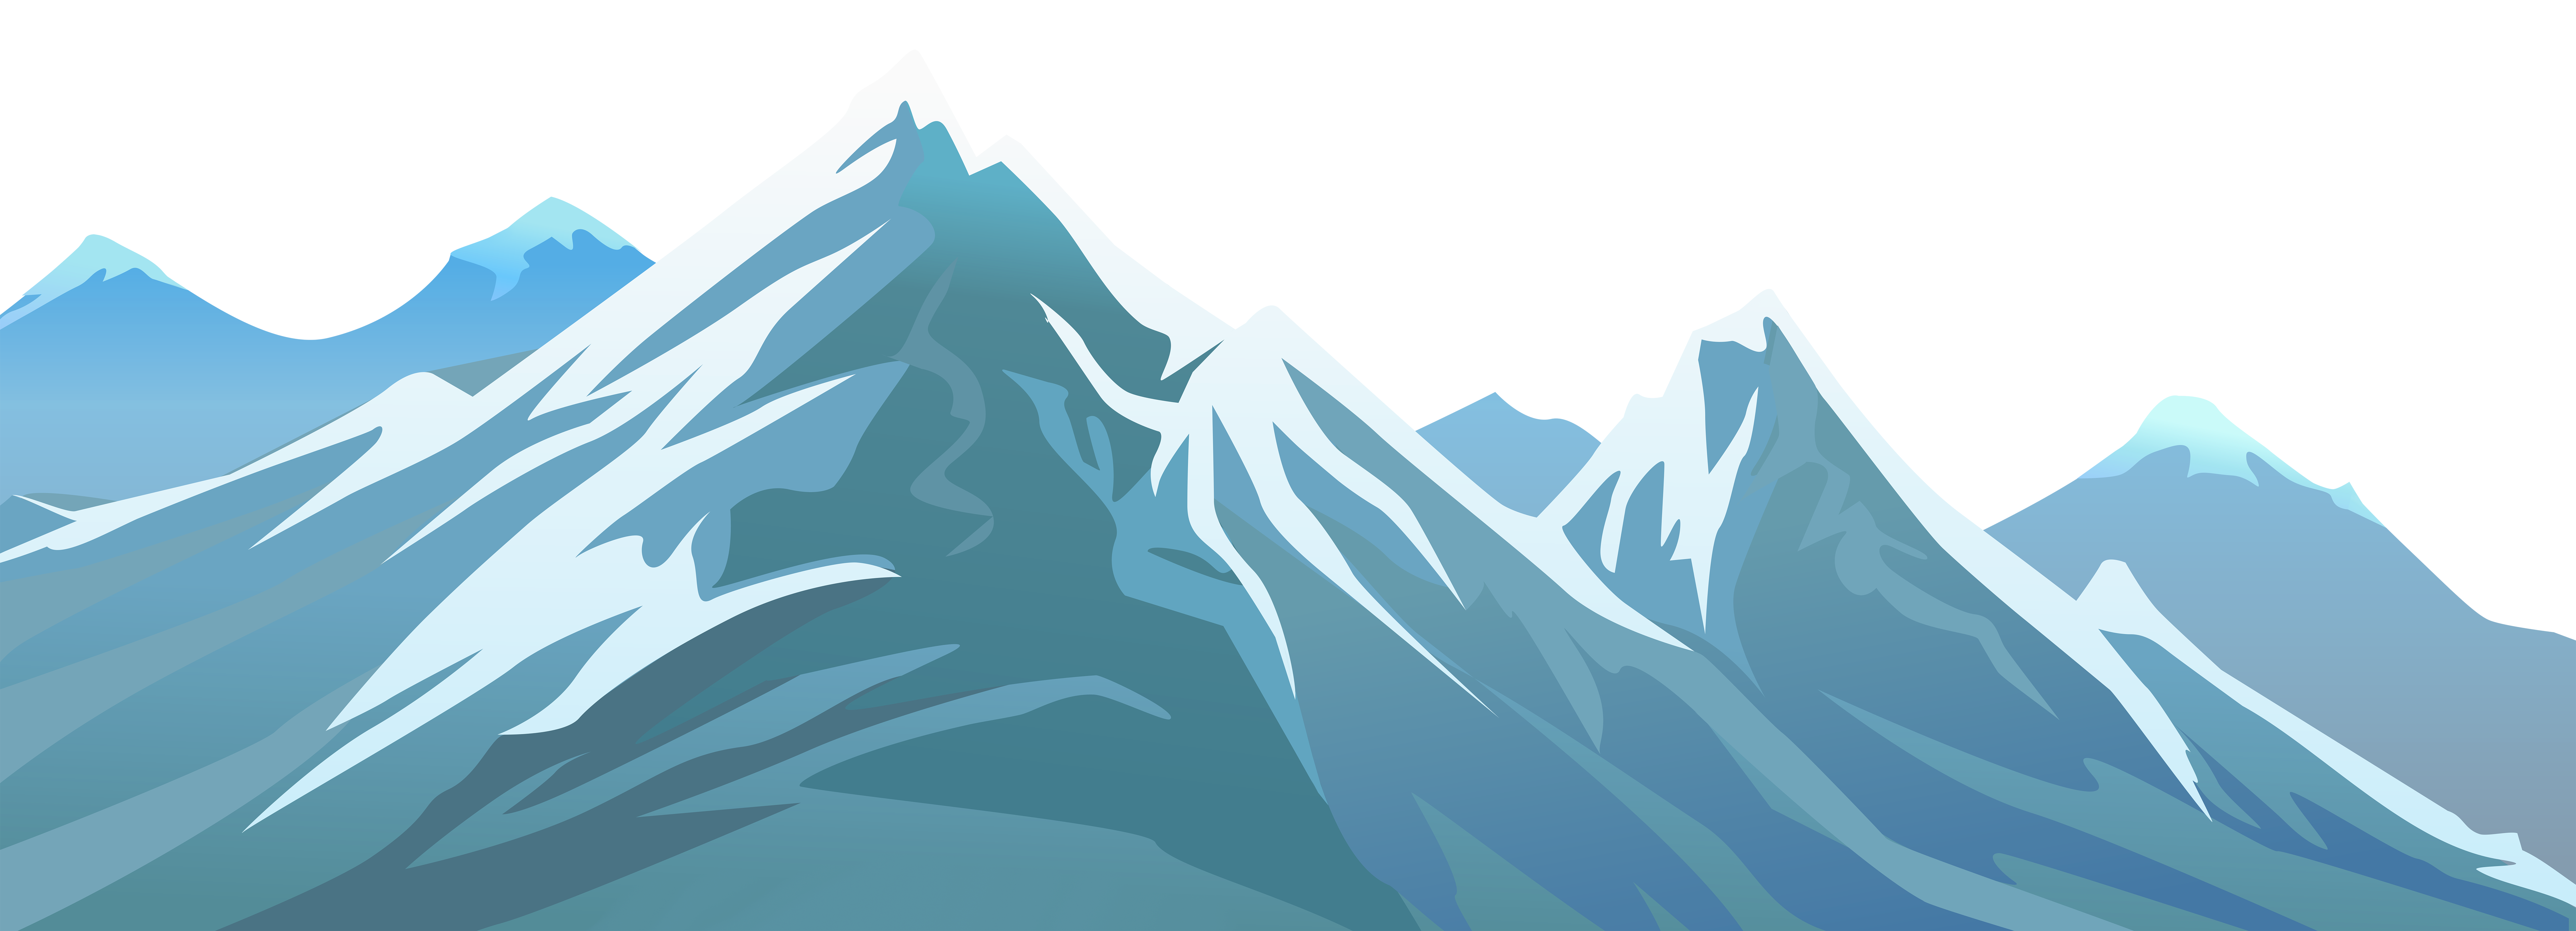 Snowy Mountain Transparent PNG Clip Art Image.